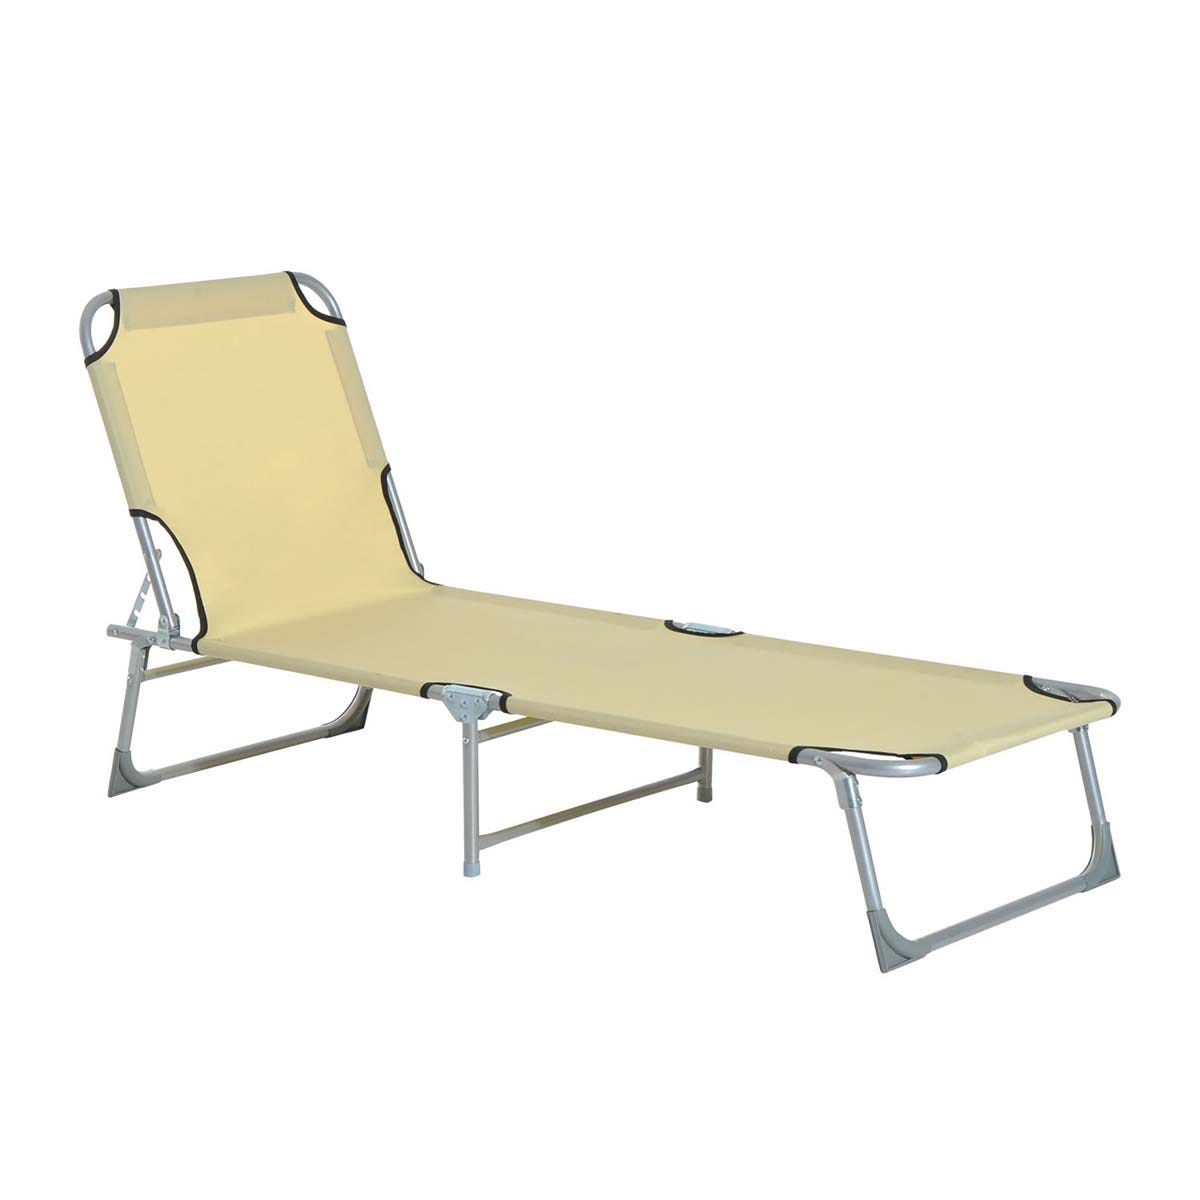 Outsunny Folding Sun Lounger - Beige